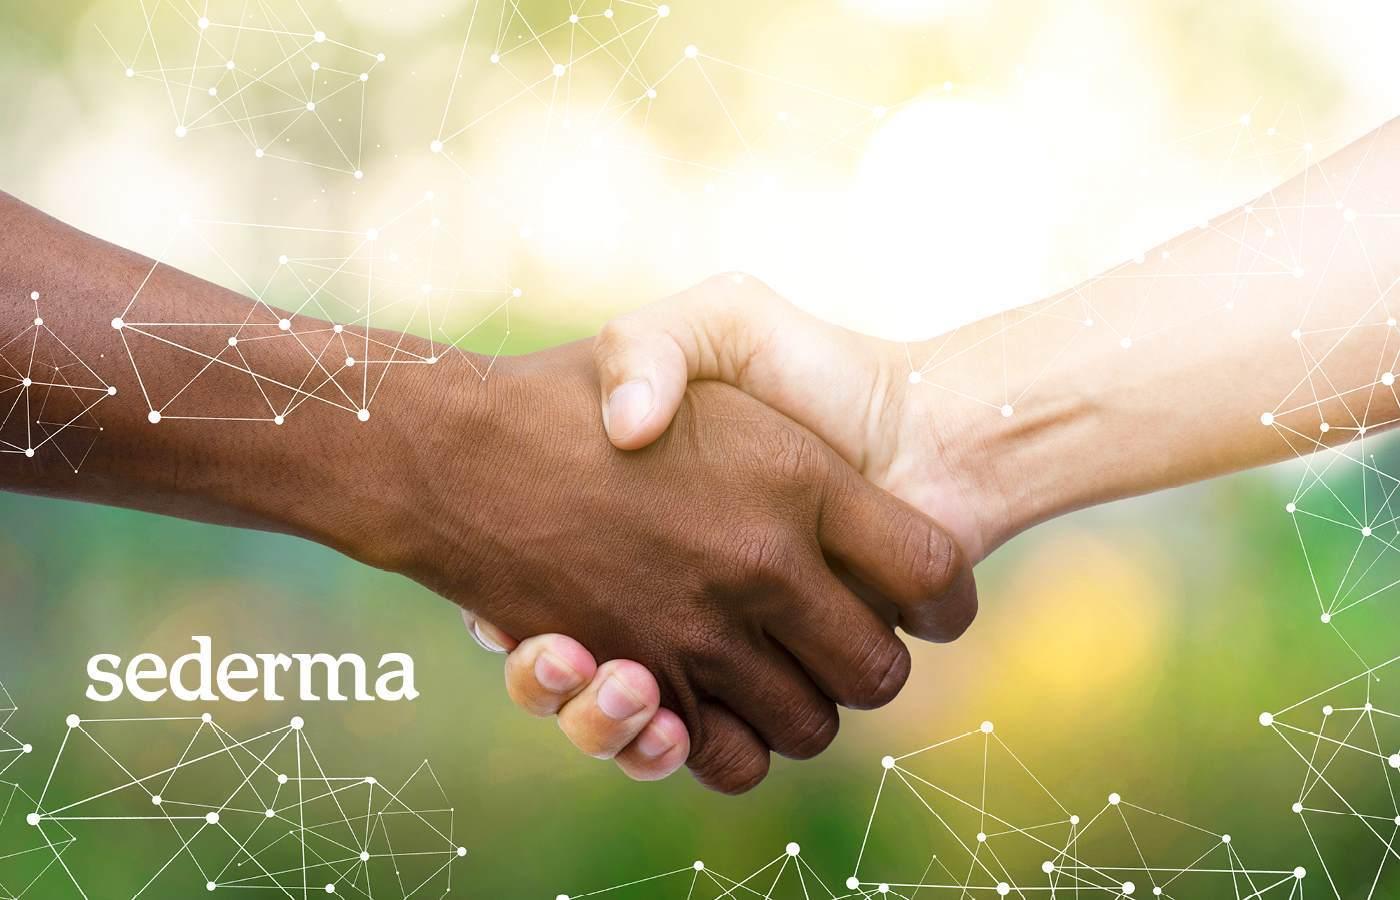 Sederma | World Leaders In Active Ingredients For Cosmetics | Croda